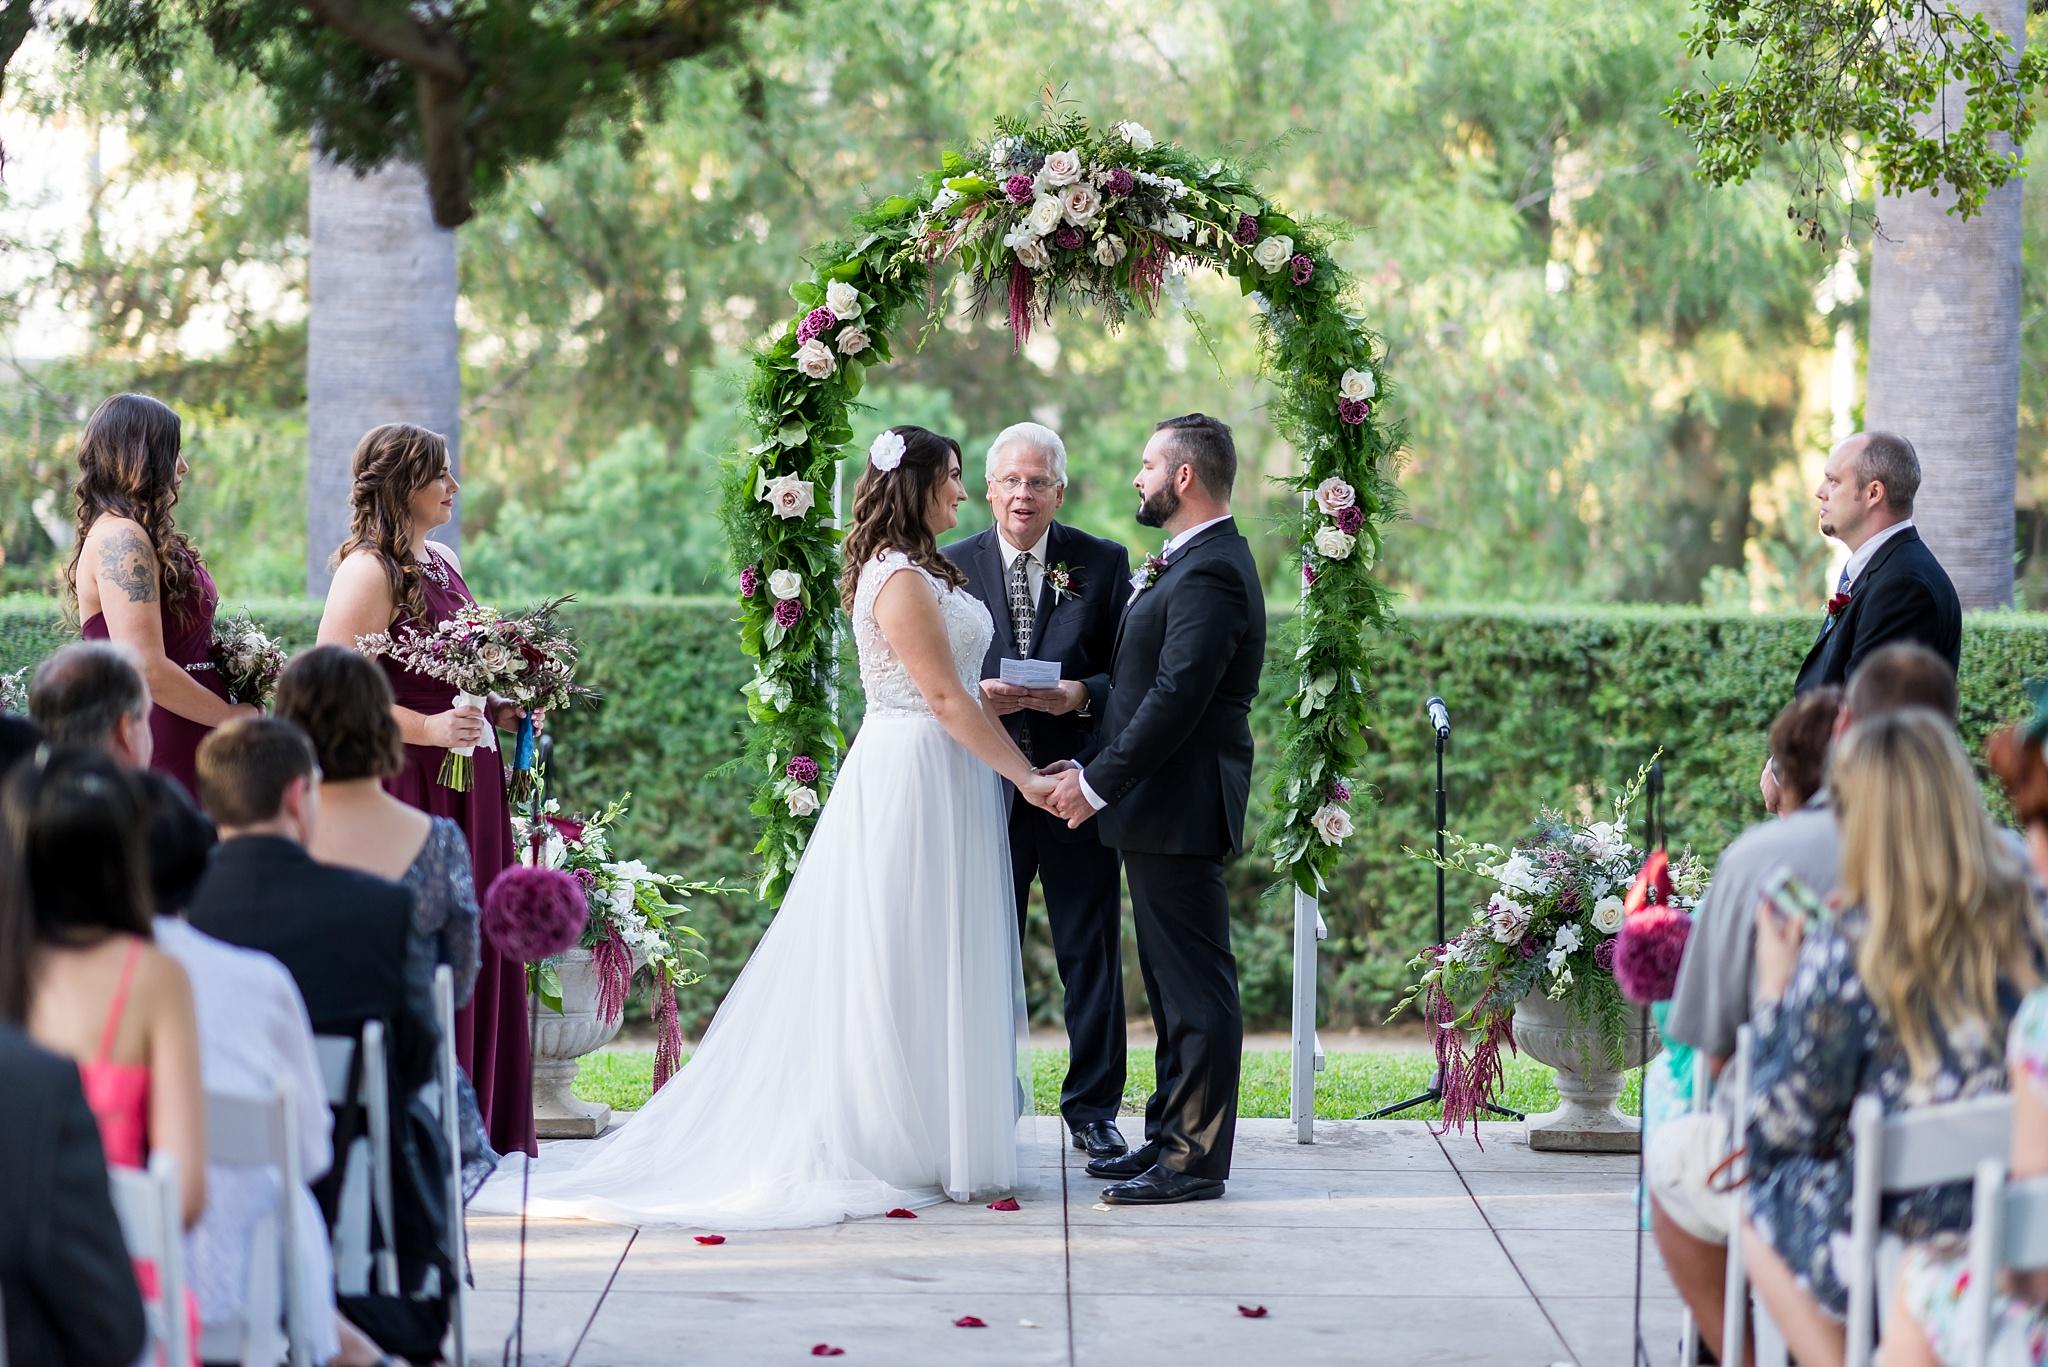 TommyandAmanda_WEDDING_BrienneMichelle_Ceremony_043_BLOG.jpg